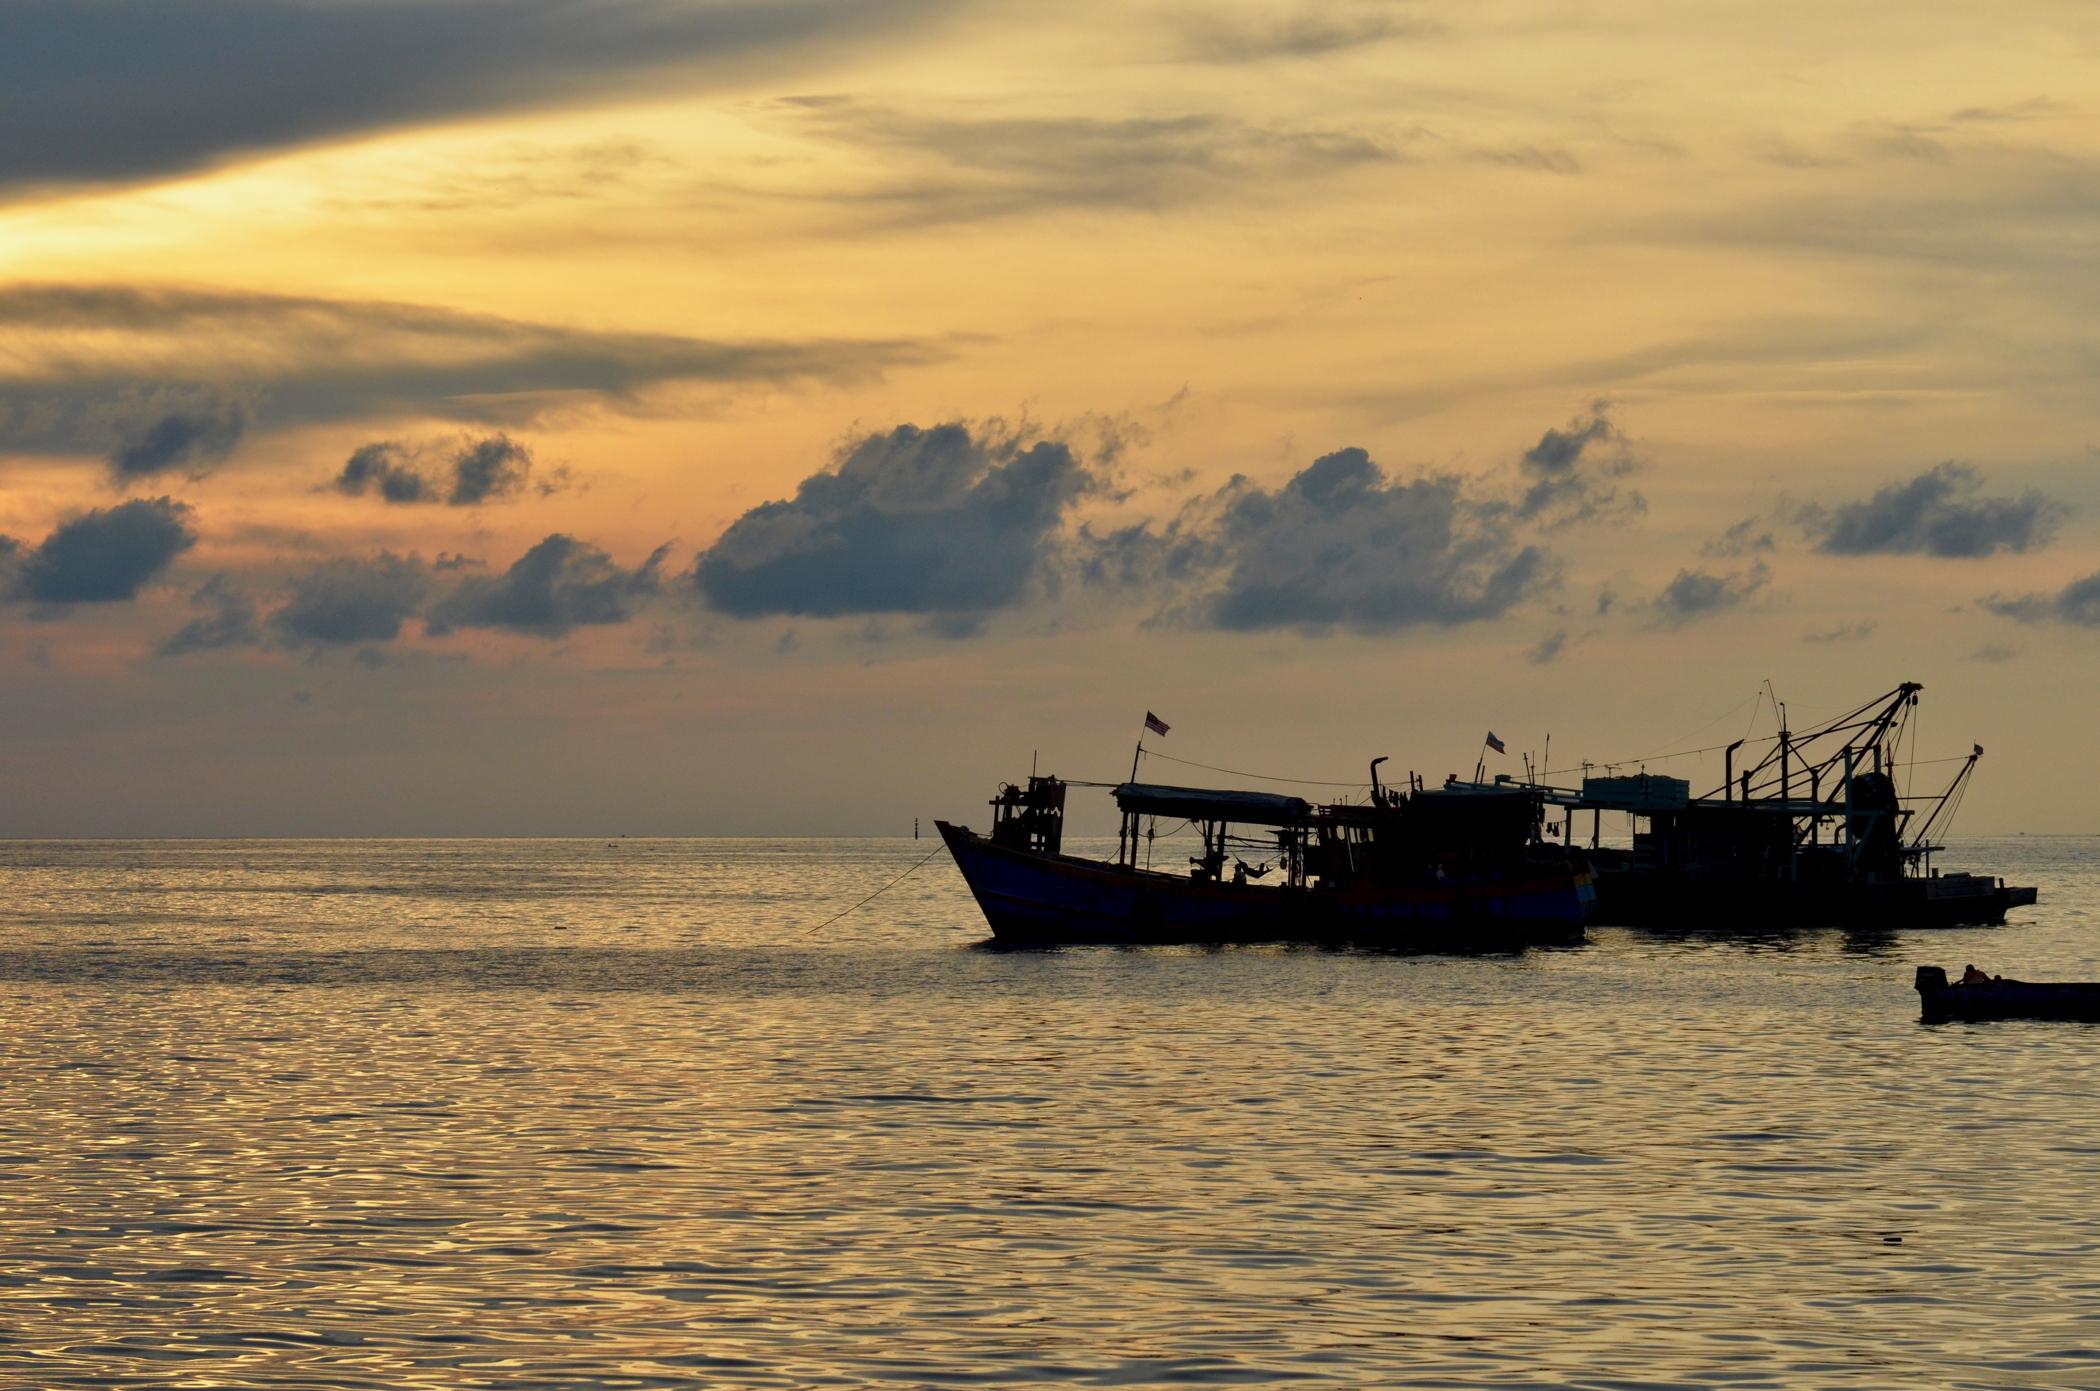 Großstadtdschungel-Malaysia-Borneo-Kota-Kinabalu-Sonnenuntergang-Borneo